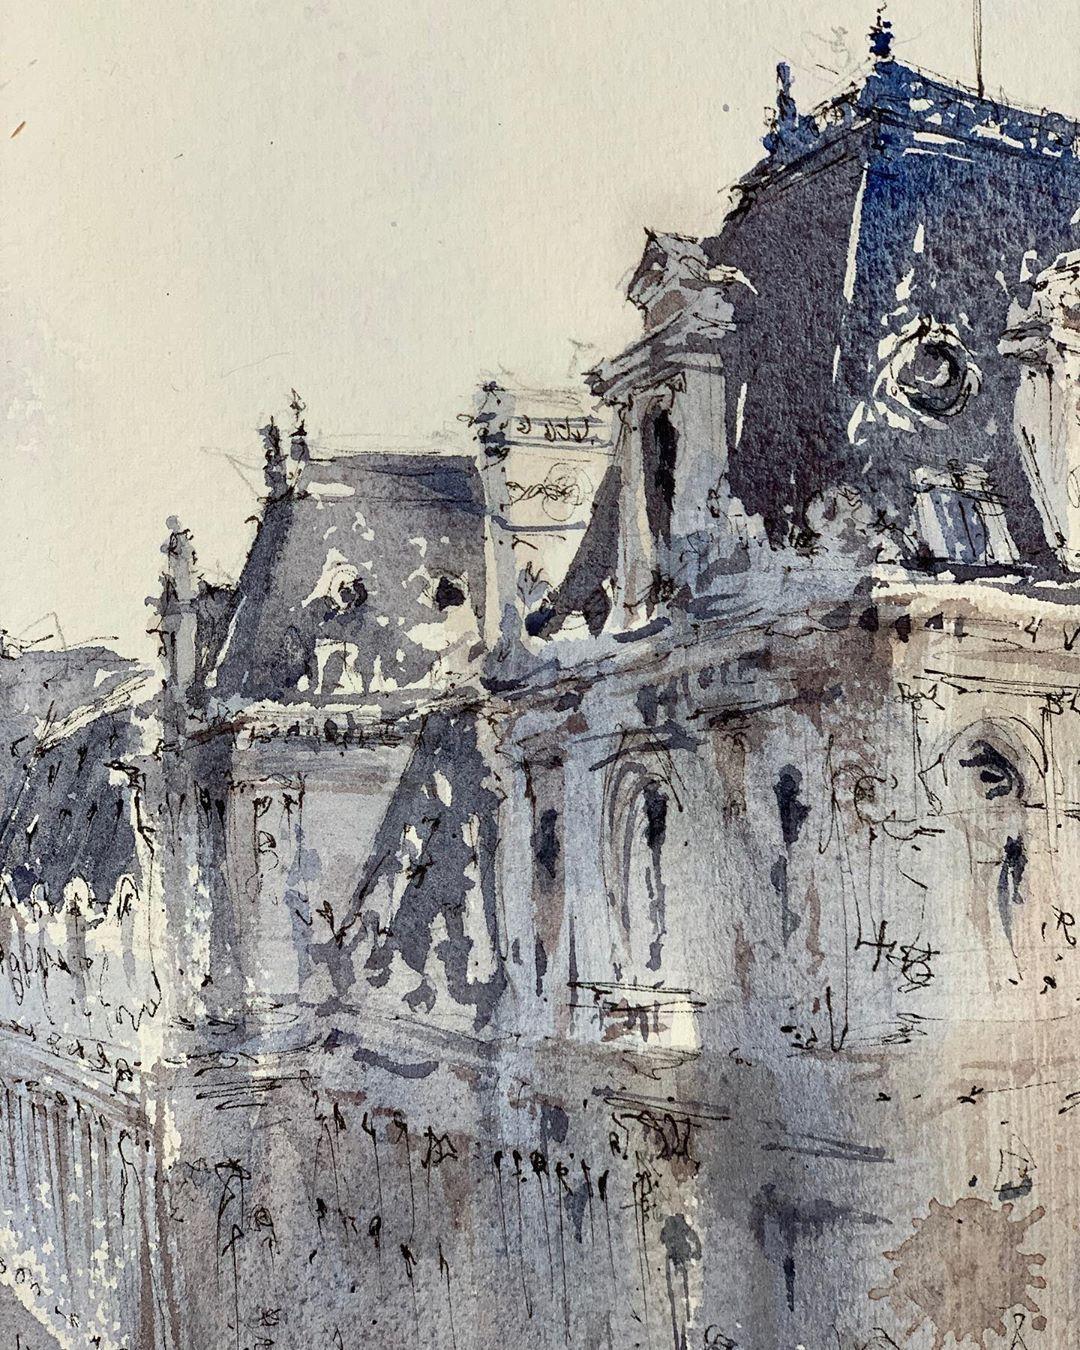 Alex Hillkurtz On Instagram Paris L Hotel De Ville I Love All